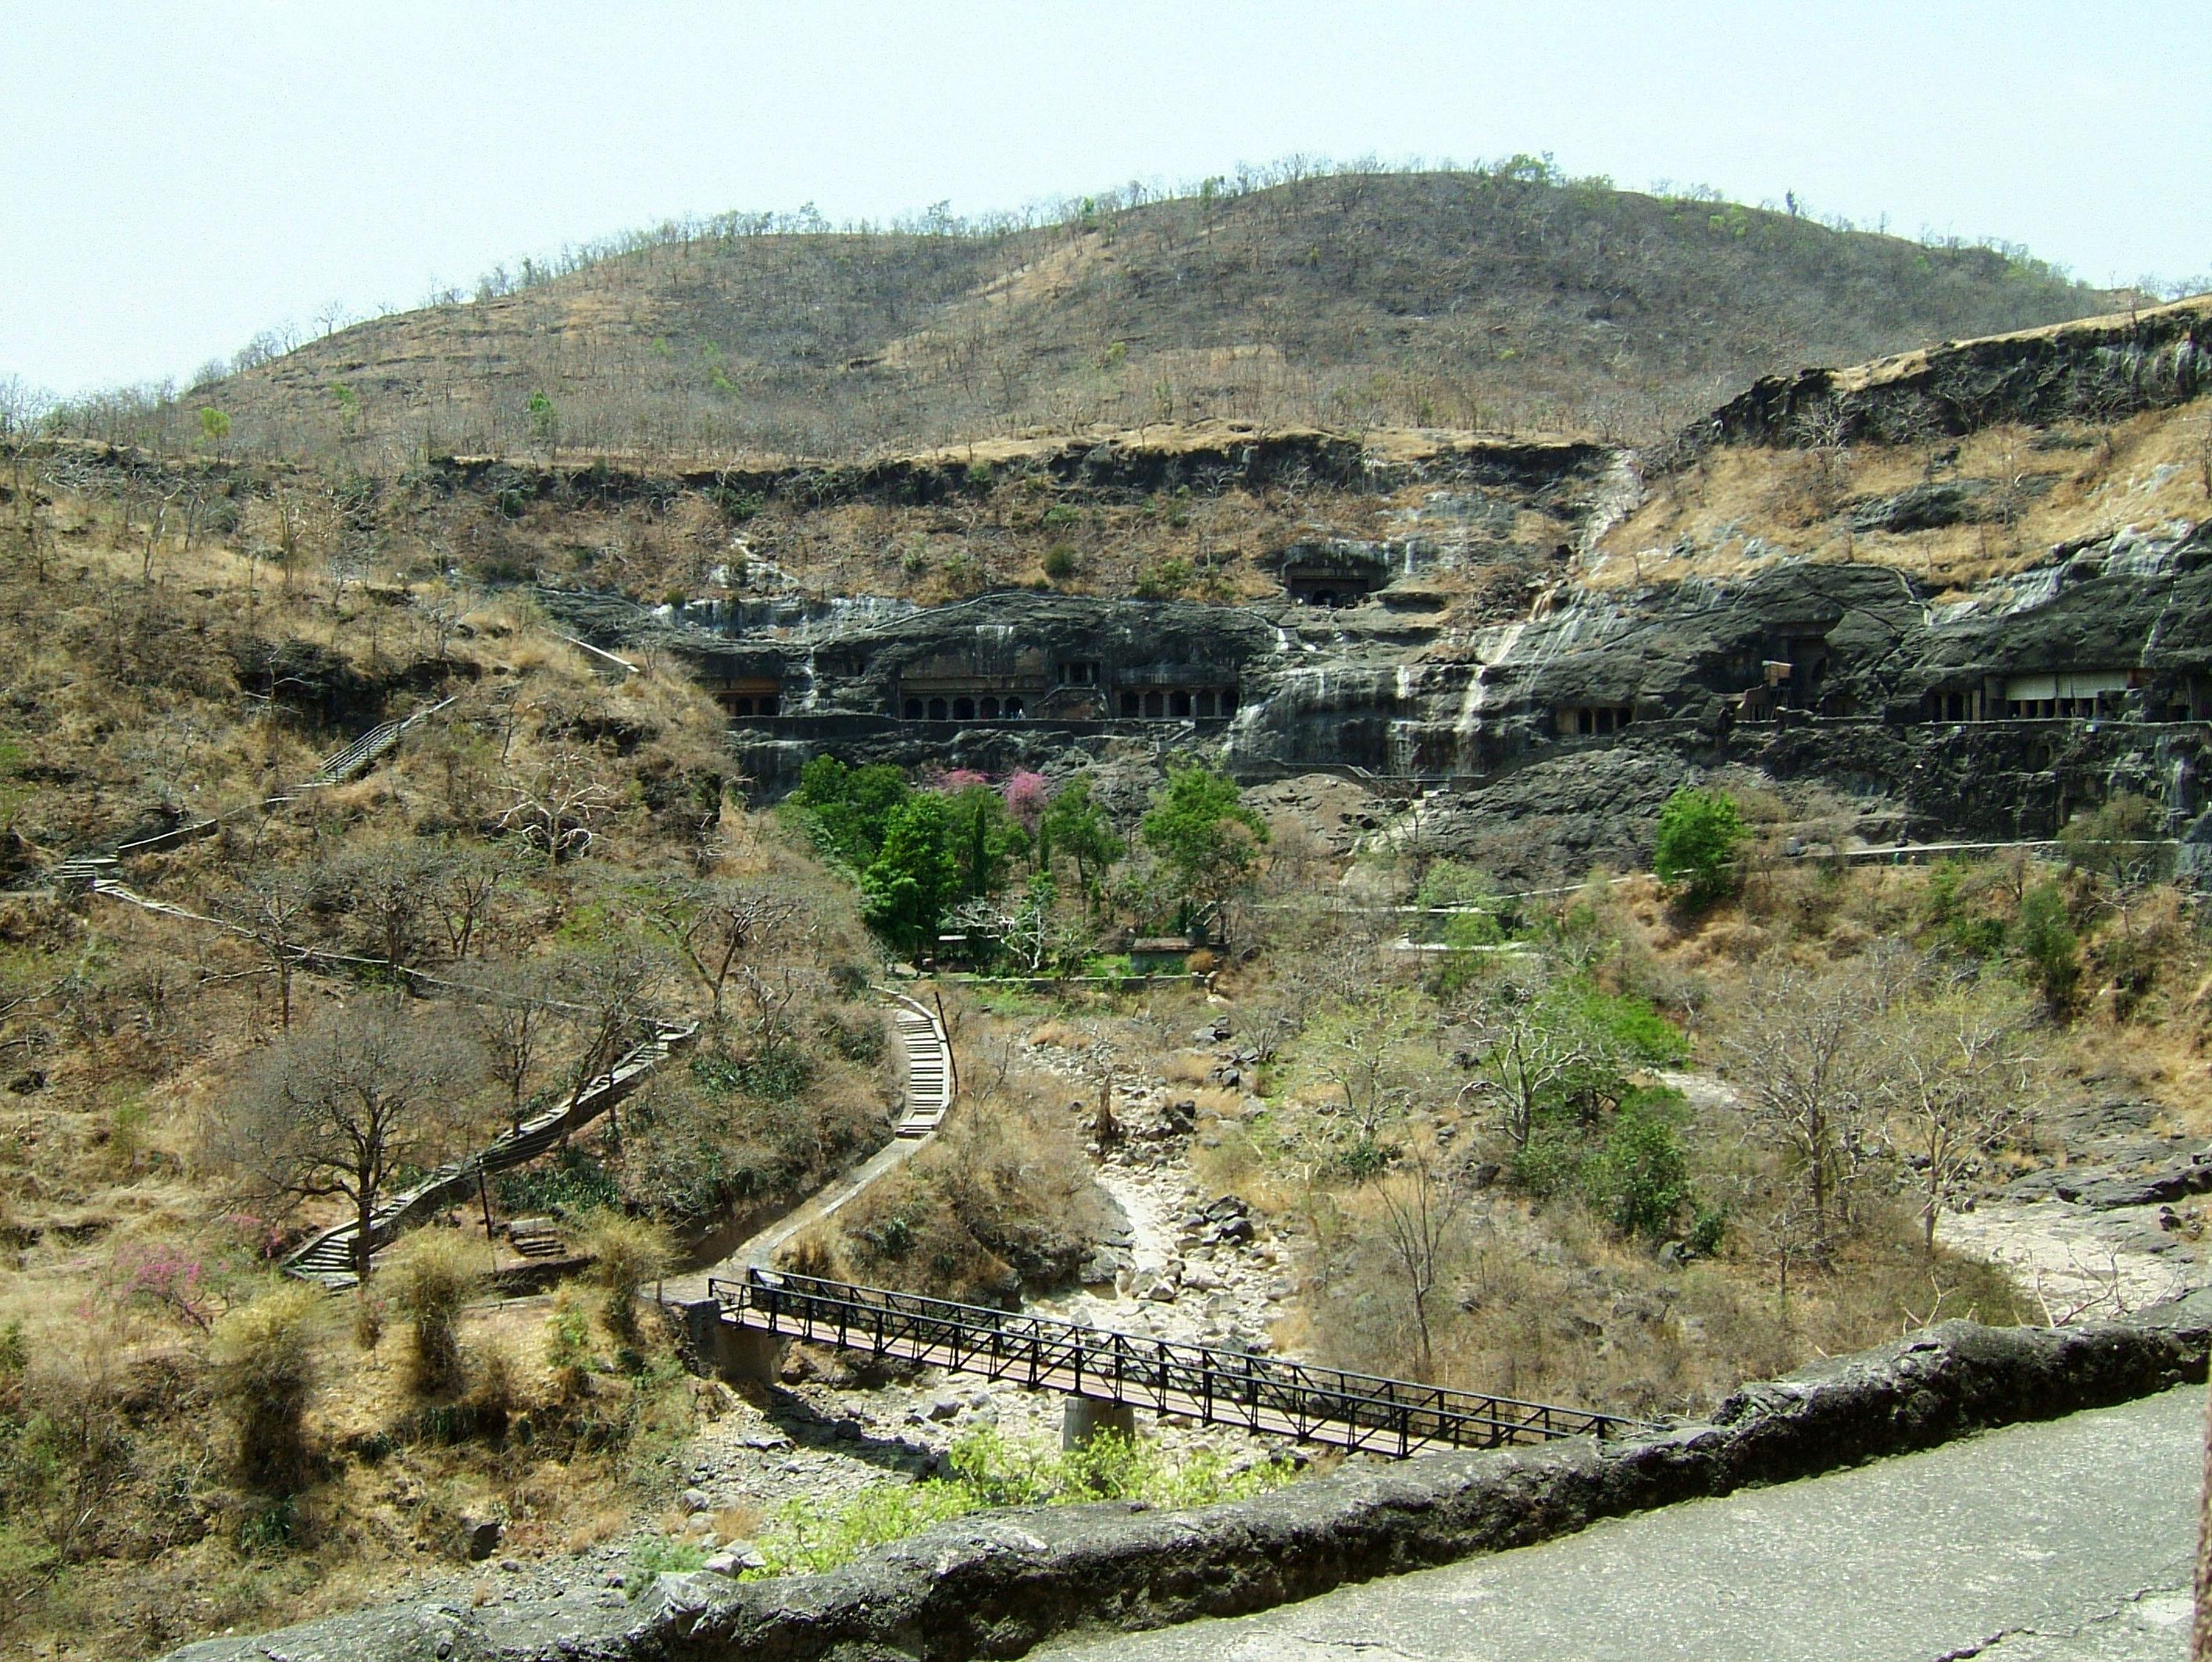 Marathwada Ajanta Caves entrance India Apr 2004 02